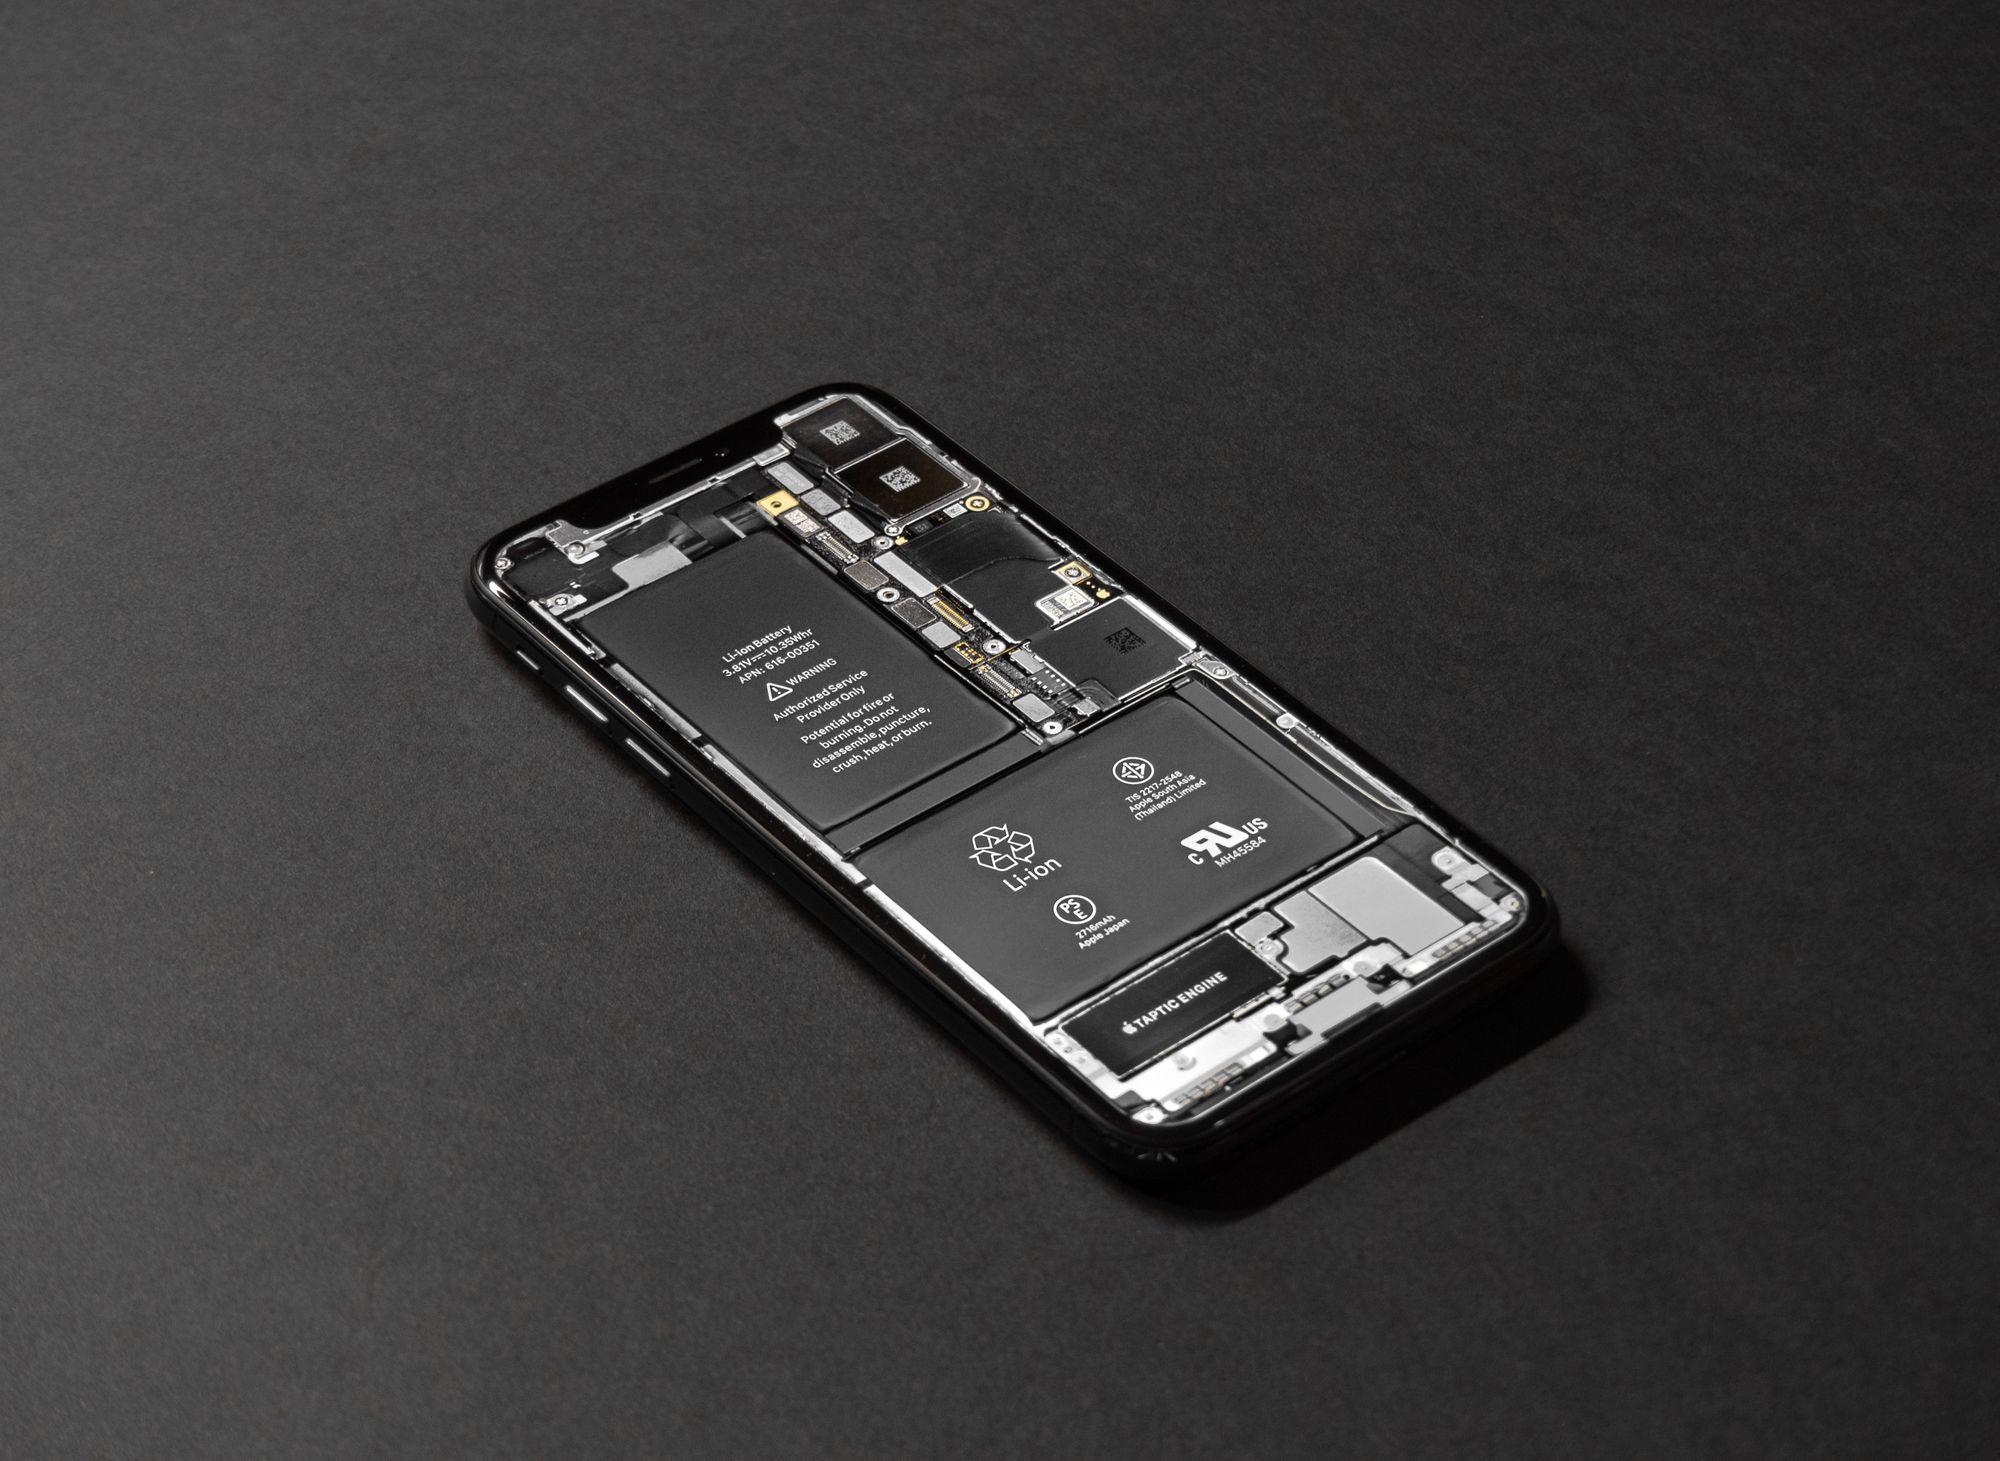 iPhone filmmaking features